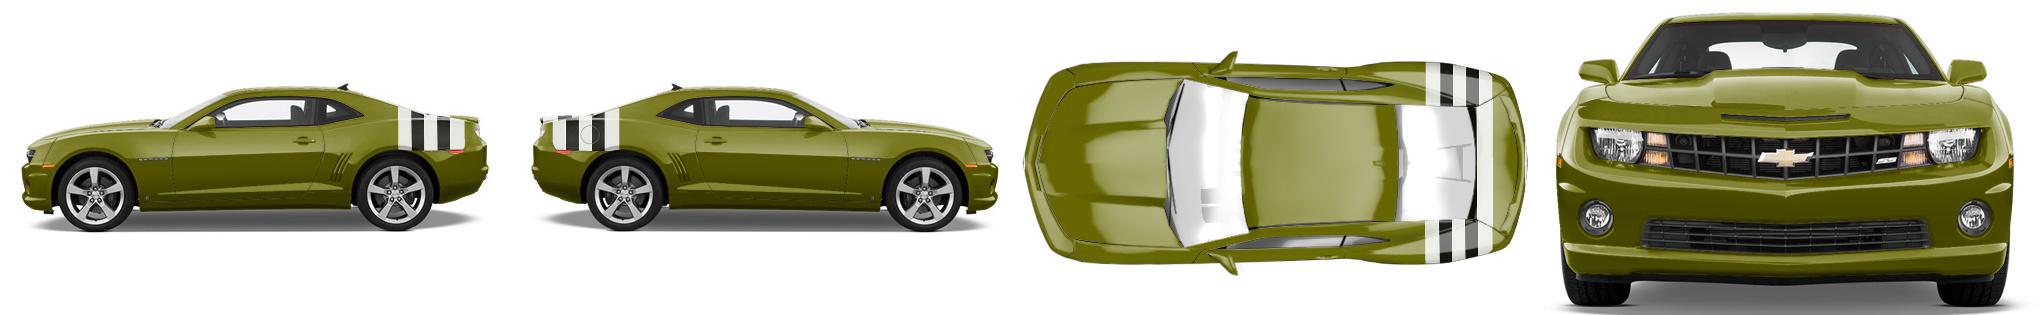 Muscle Car Wrap #53397